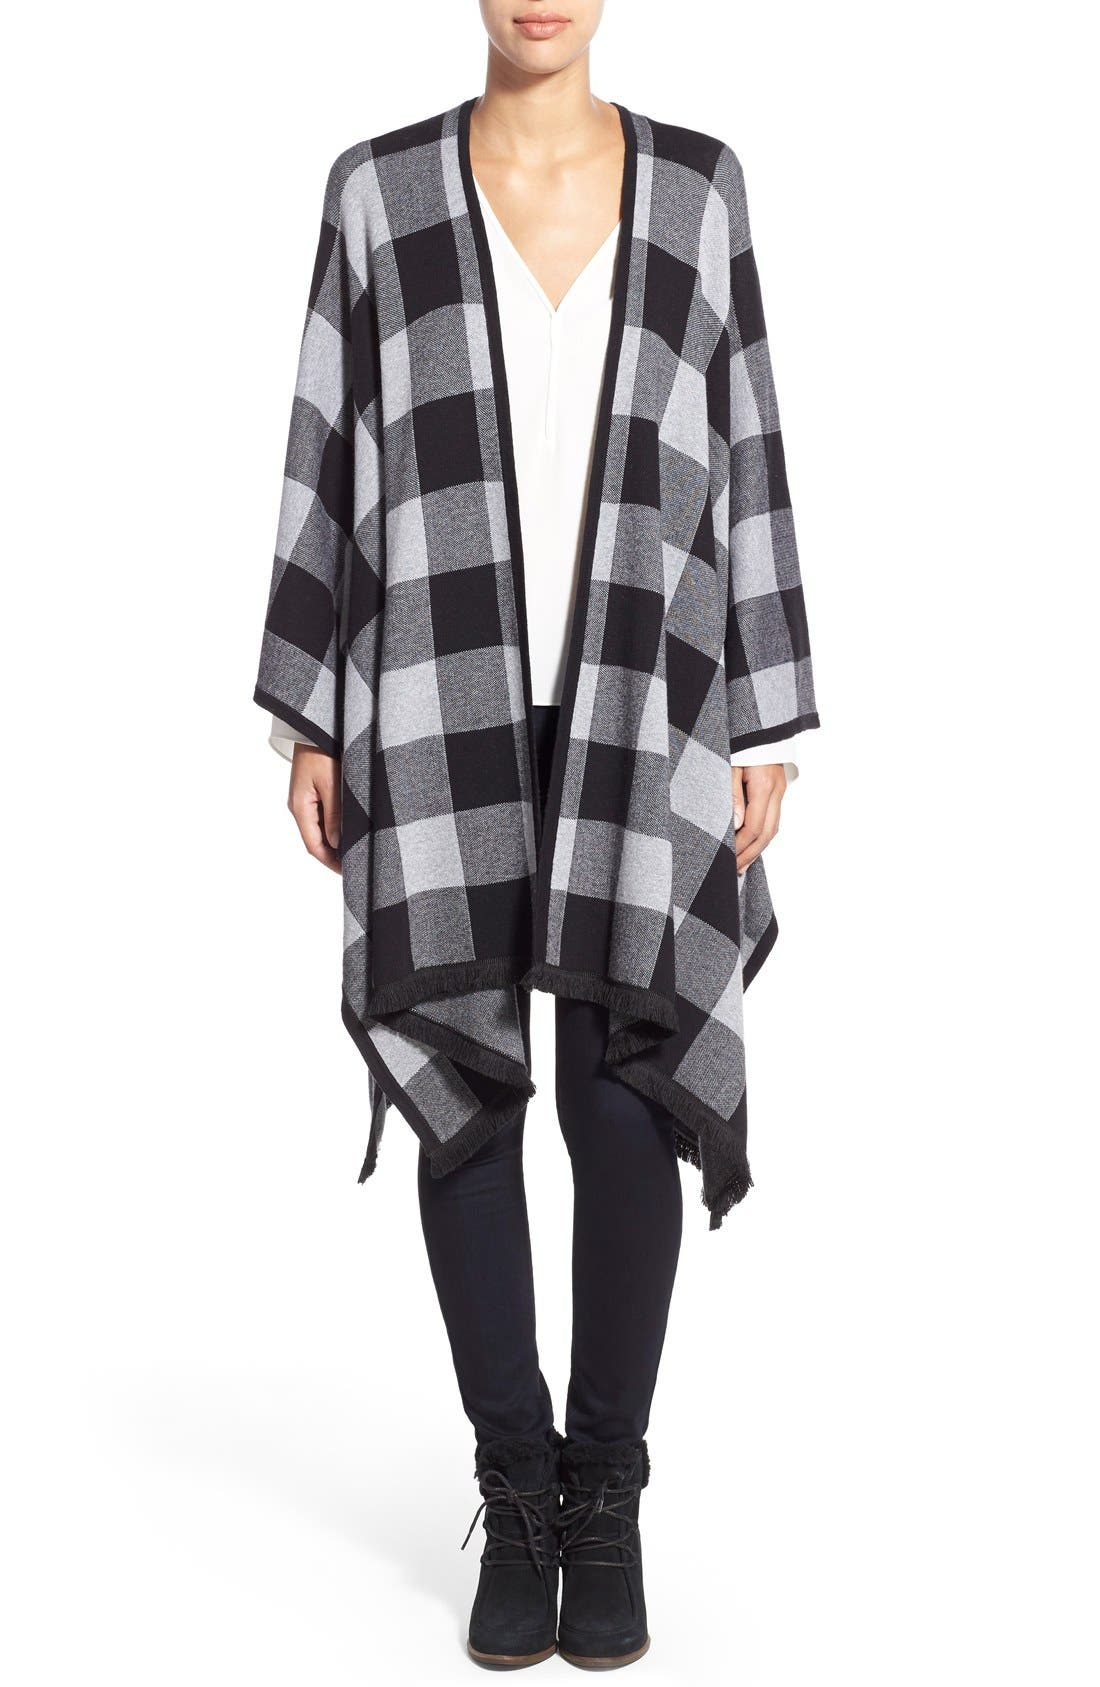 Main Image - kensie Check Plaid Blanket Cardigan